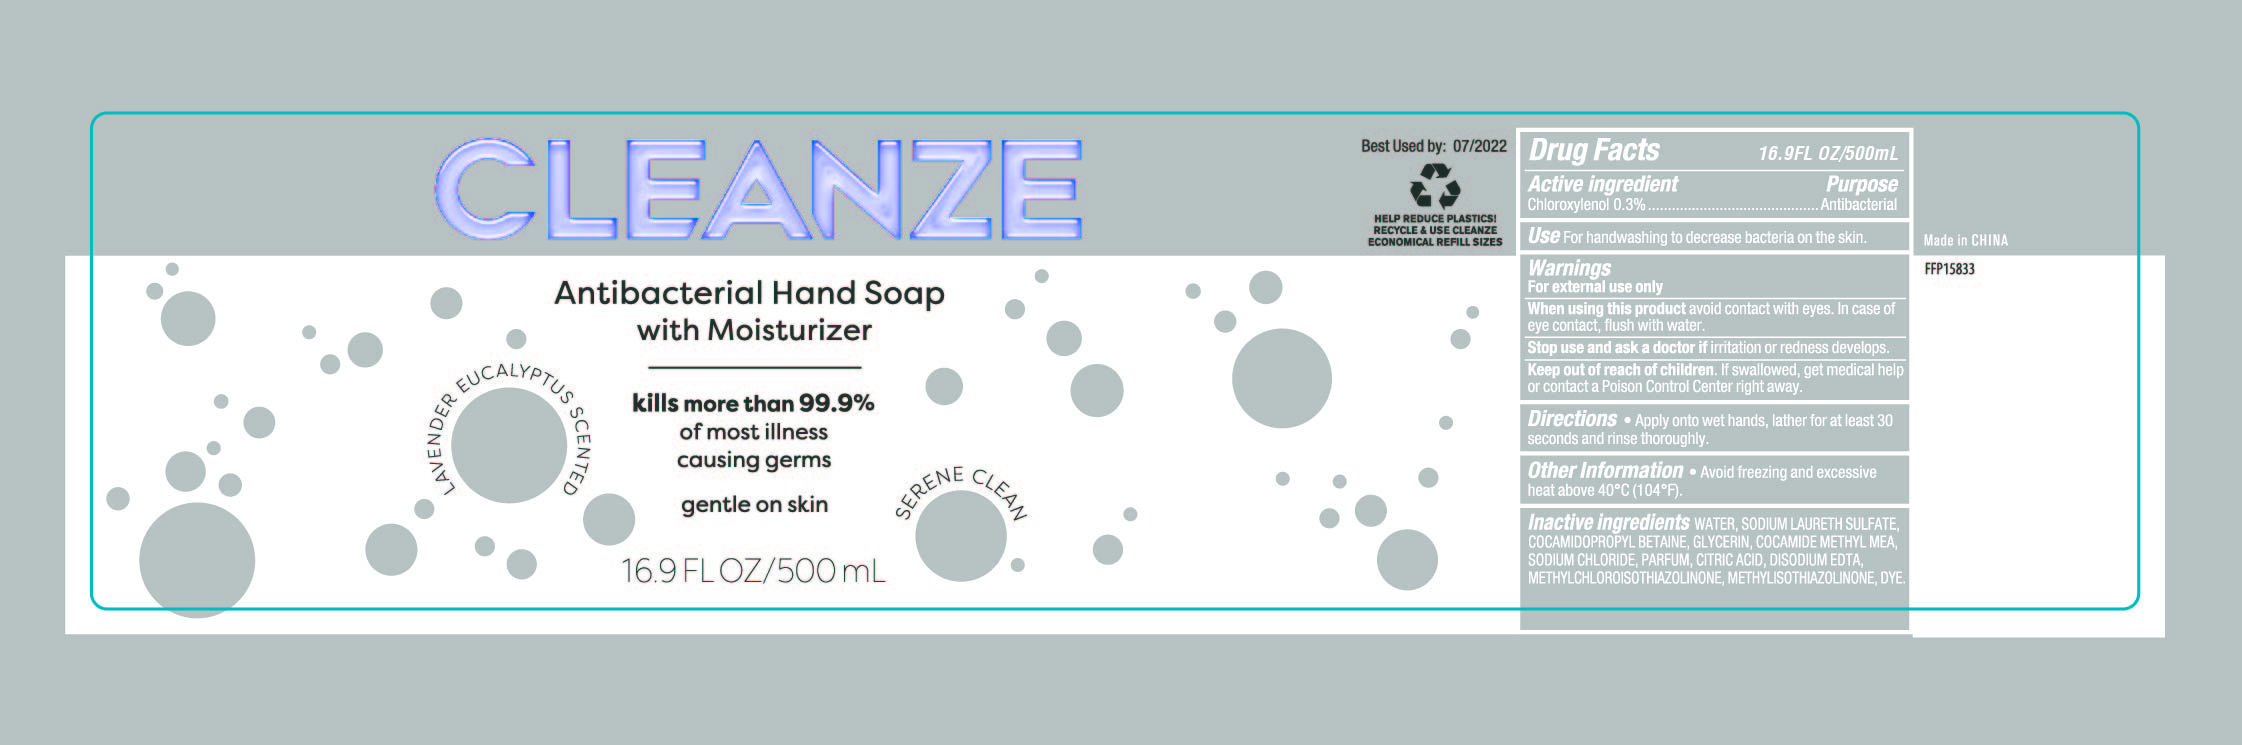 image of Hand Sanitizer 5